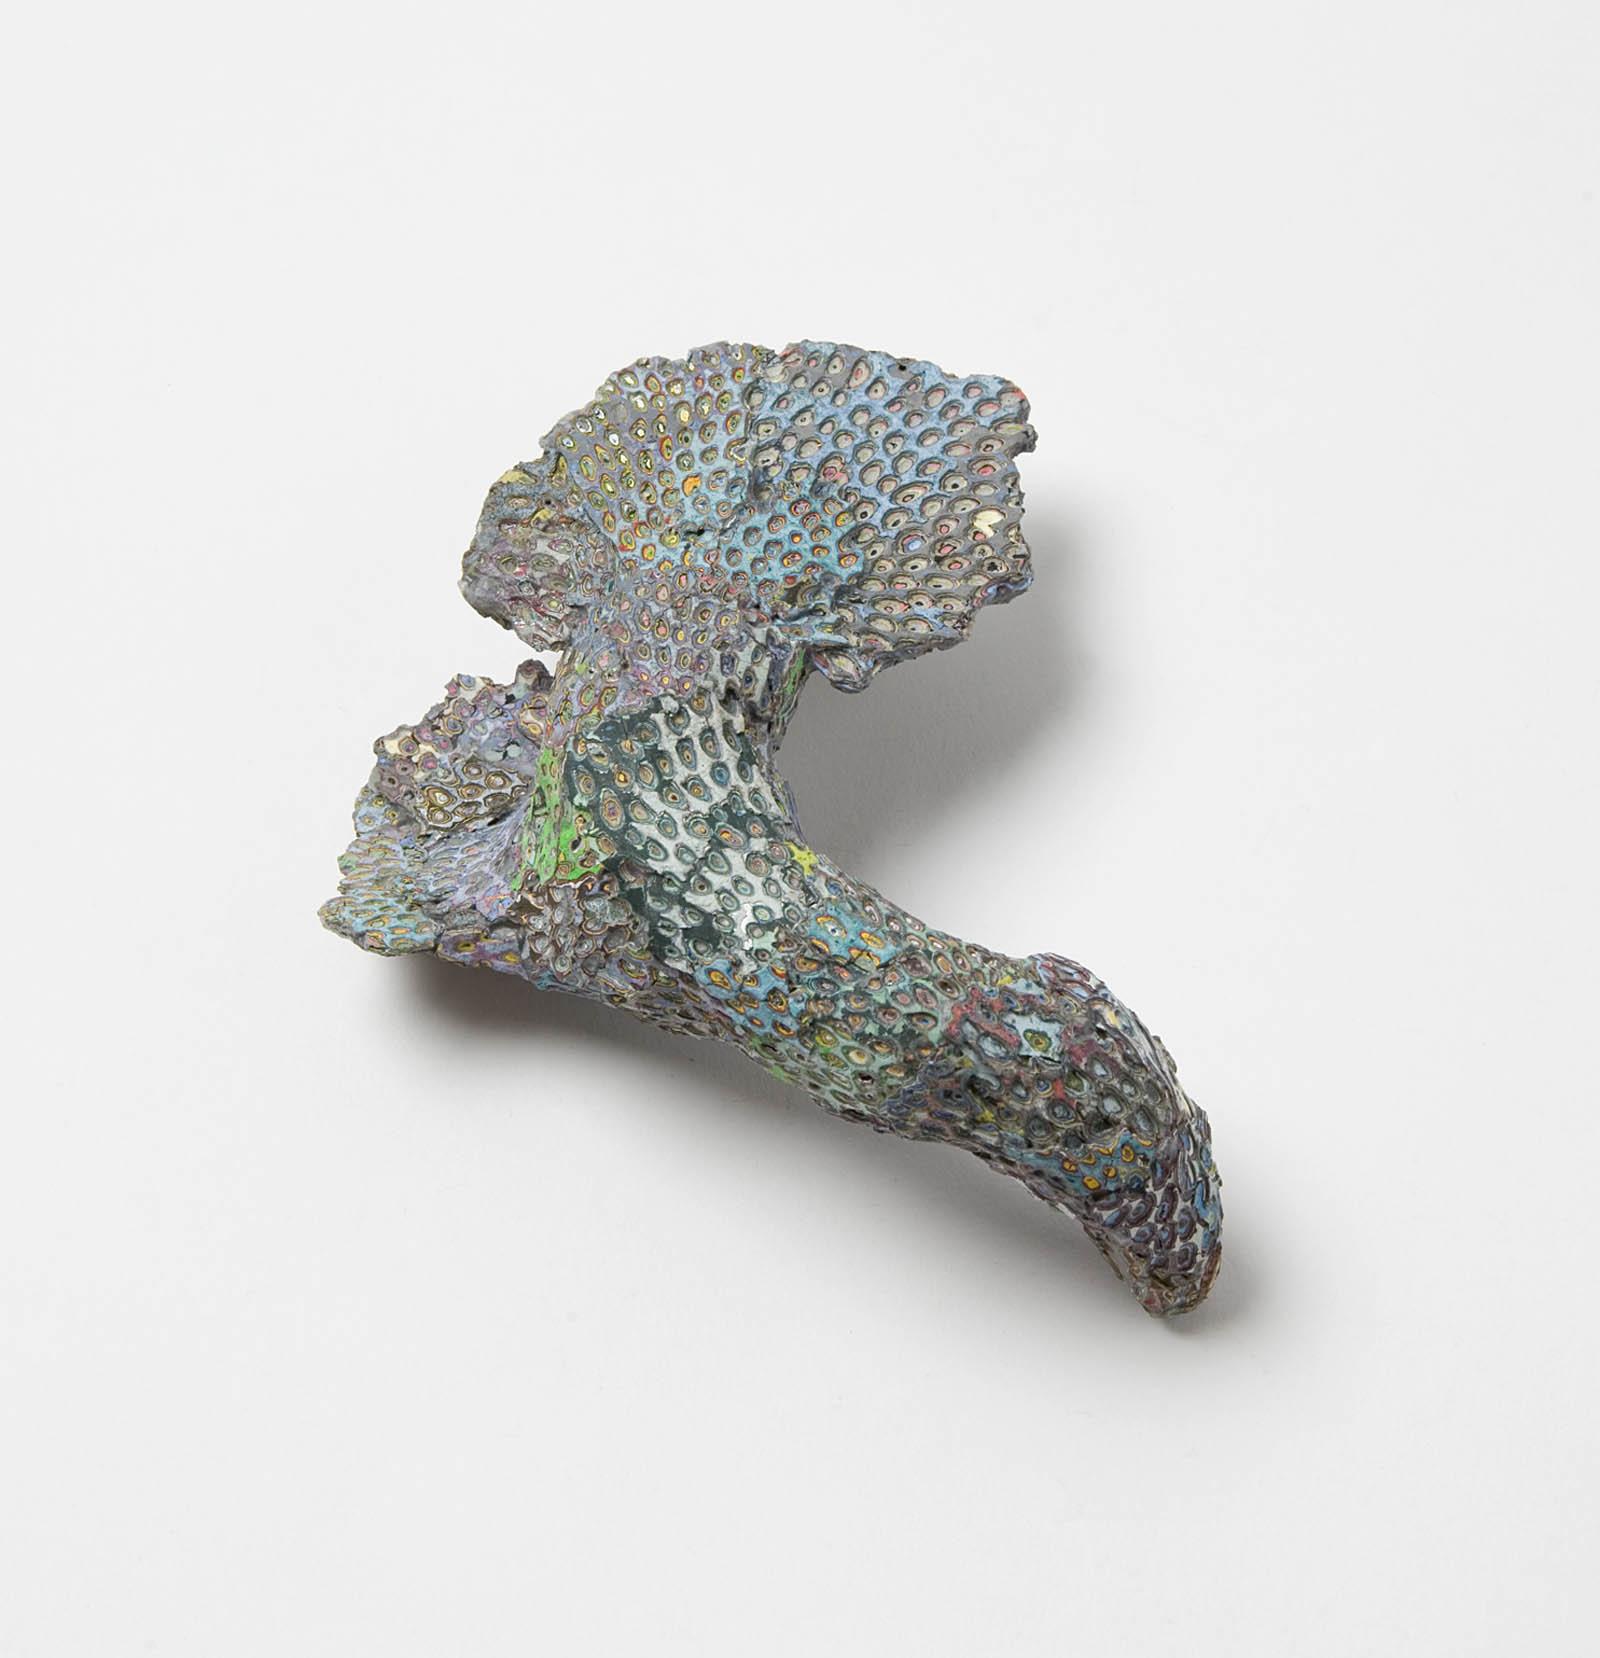 """Raduga Fossil"" I Brooch, 2014 I Graffiti, wood, silver, stainless steel I Photo: Mirei Takeuchi"